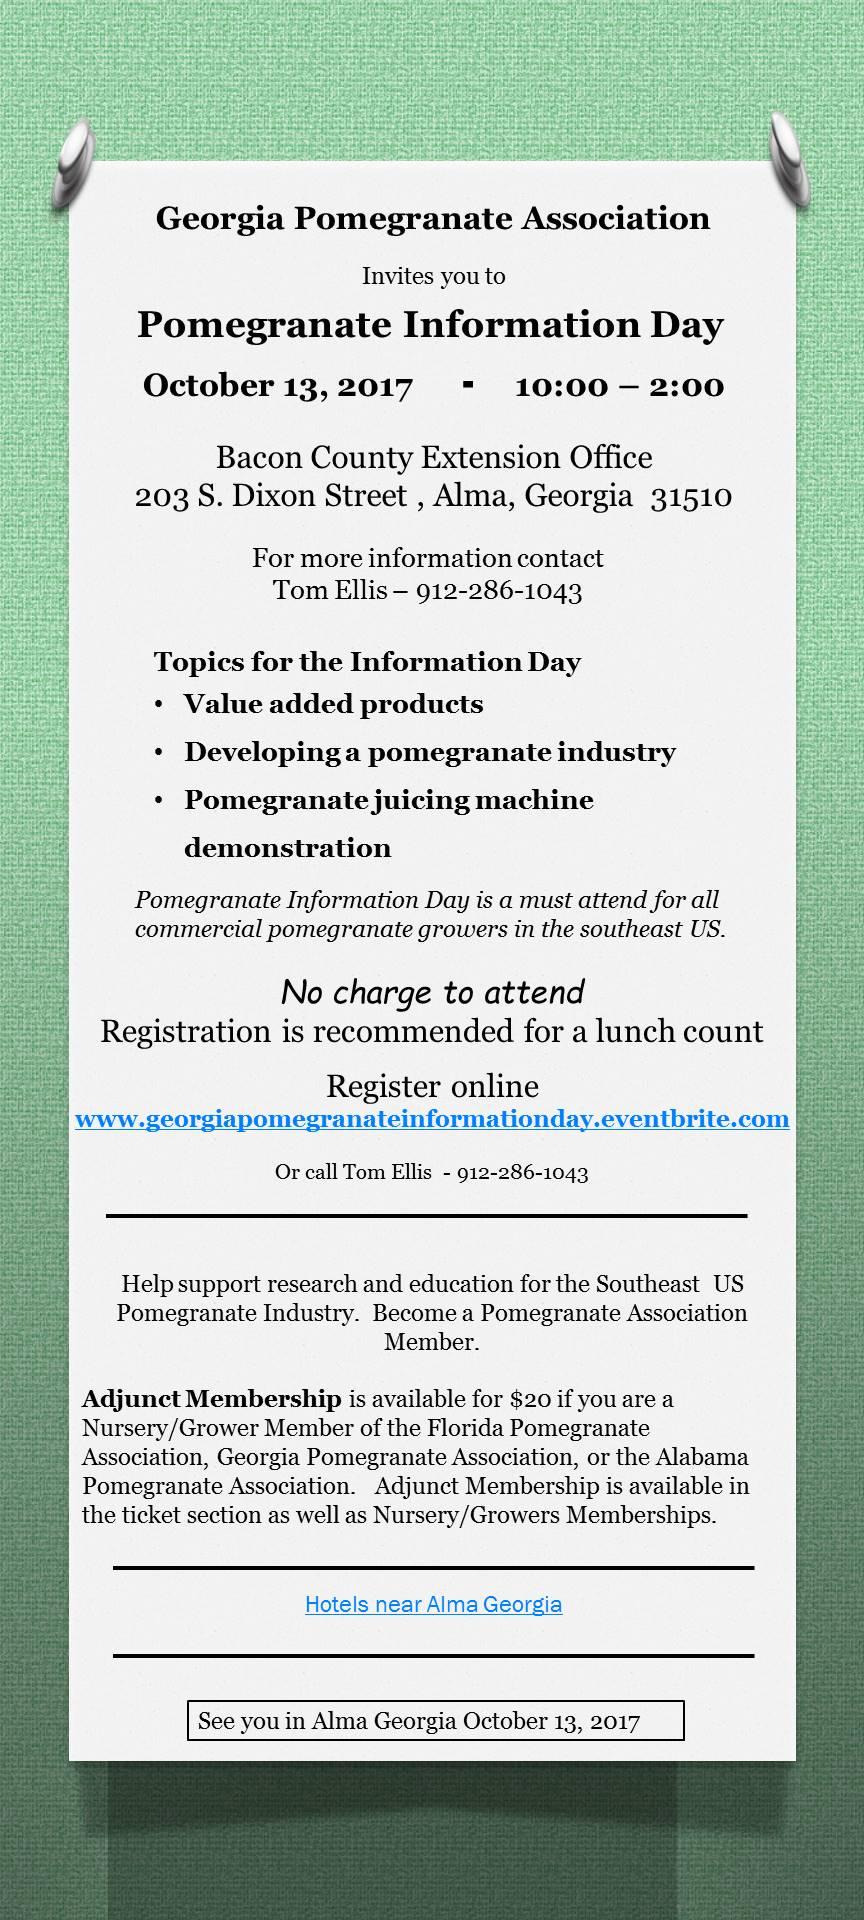 Registration information for Georgia Pomegranate Day October 13, 2017